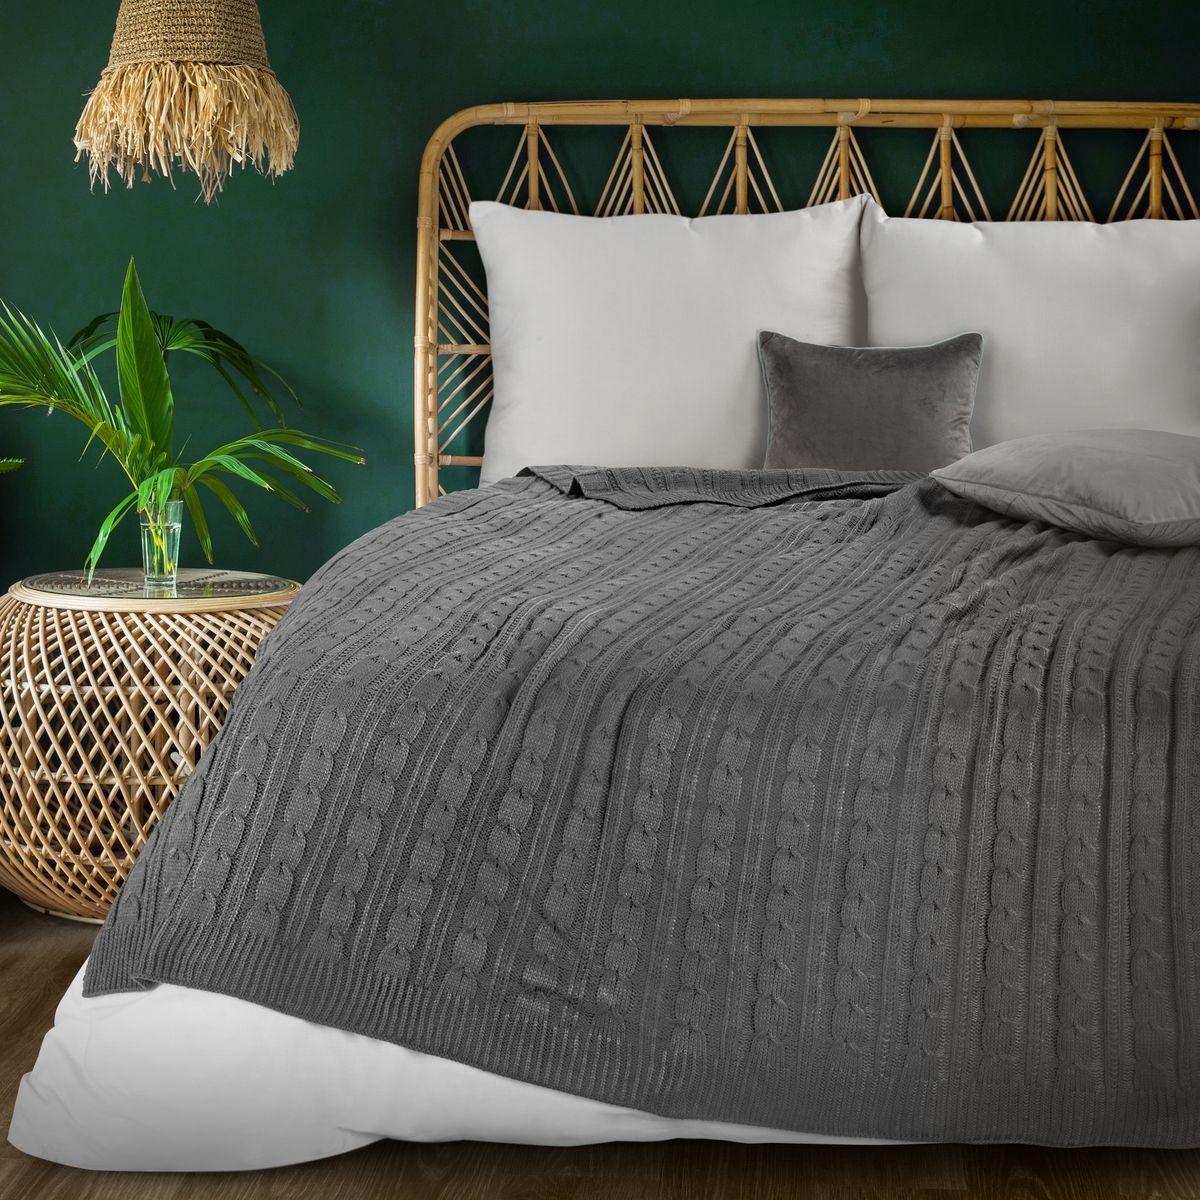 Tmavo sivá teplá pletená akrylová deka 130 x 170 cm Šírka: 130 cm   Dĺžka: 170 cm